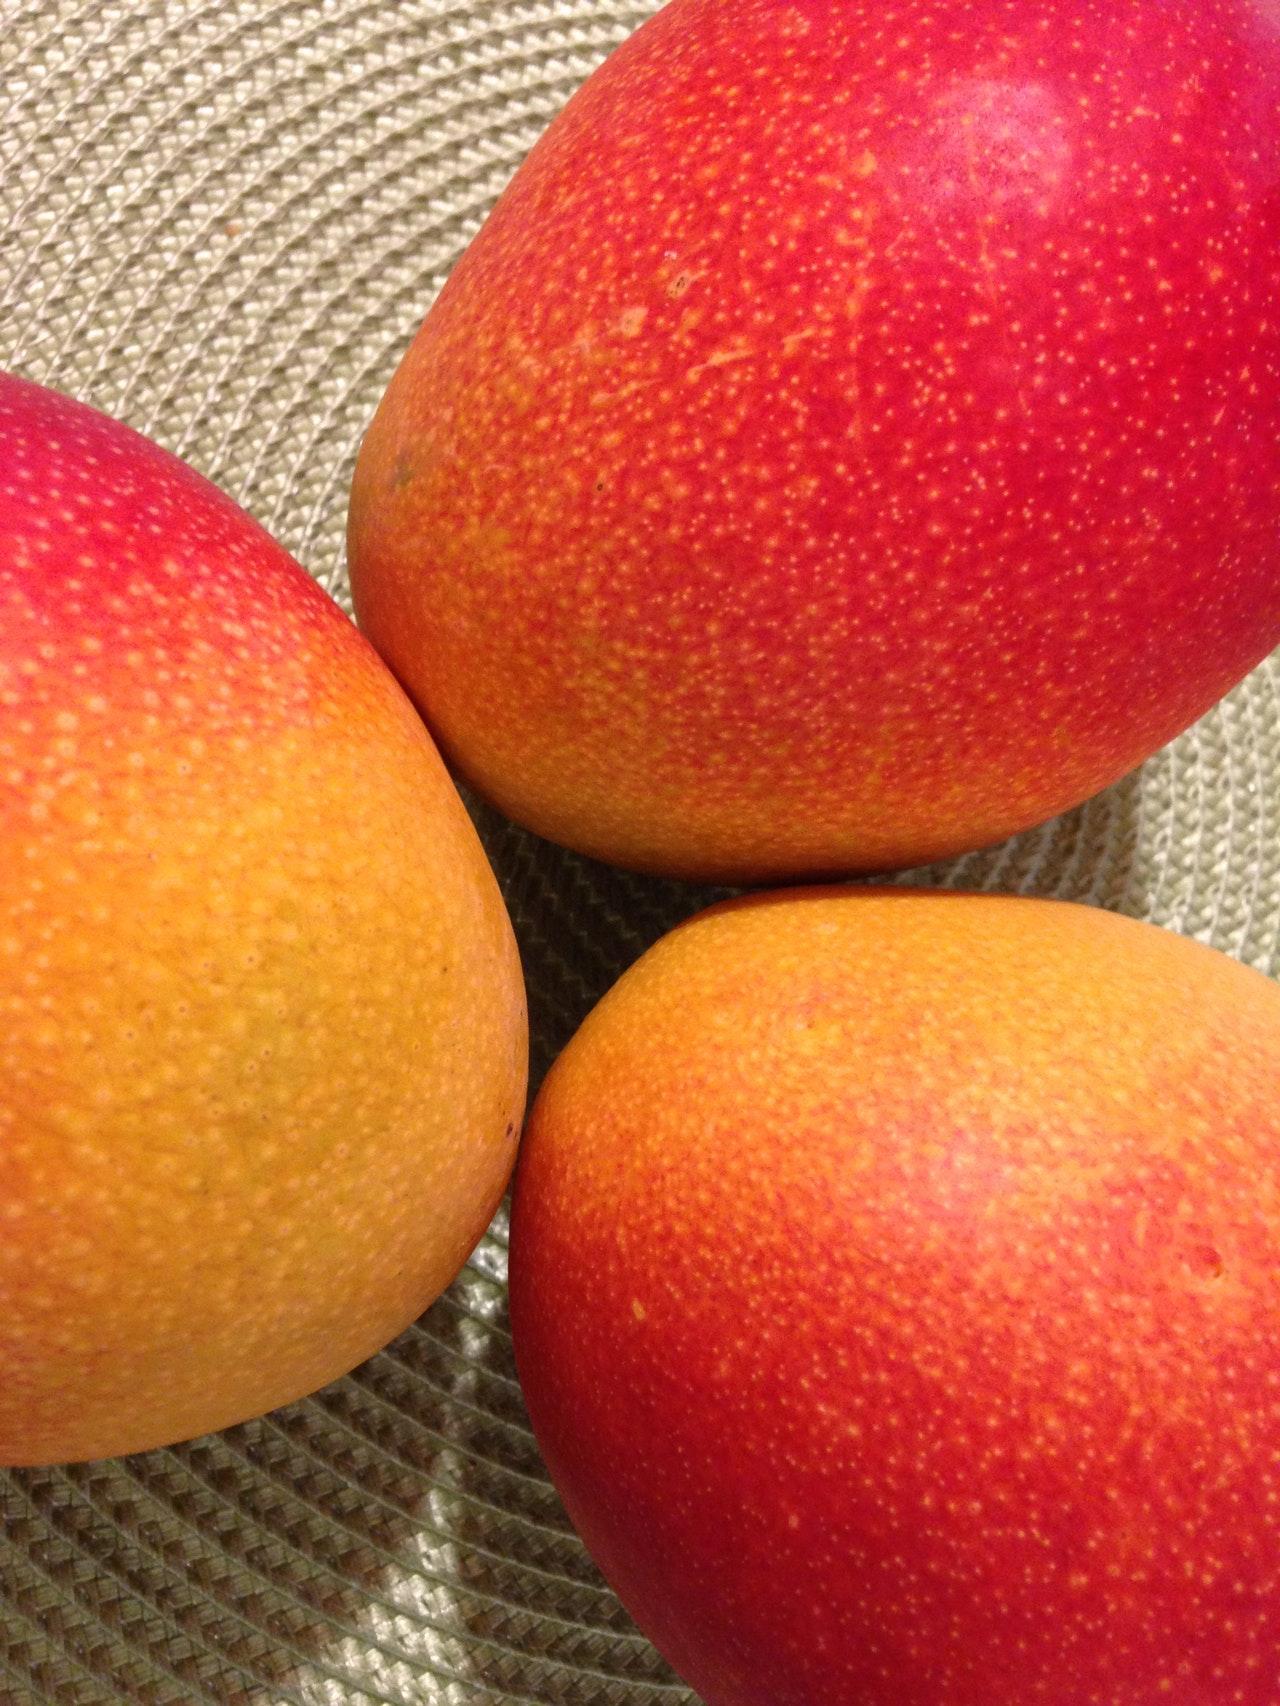 Alphonso Mangoes, mangoes to home,